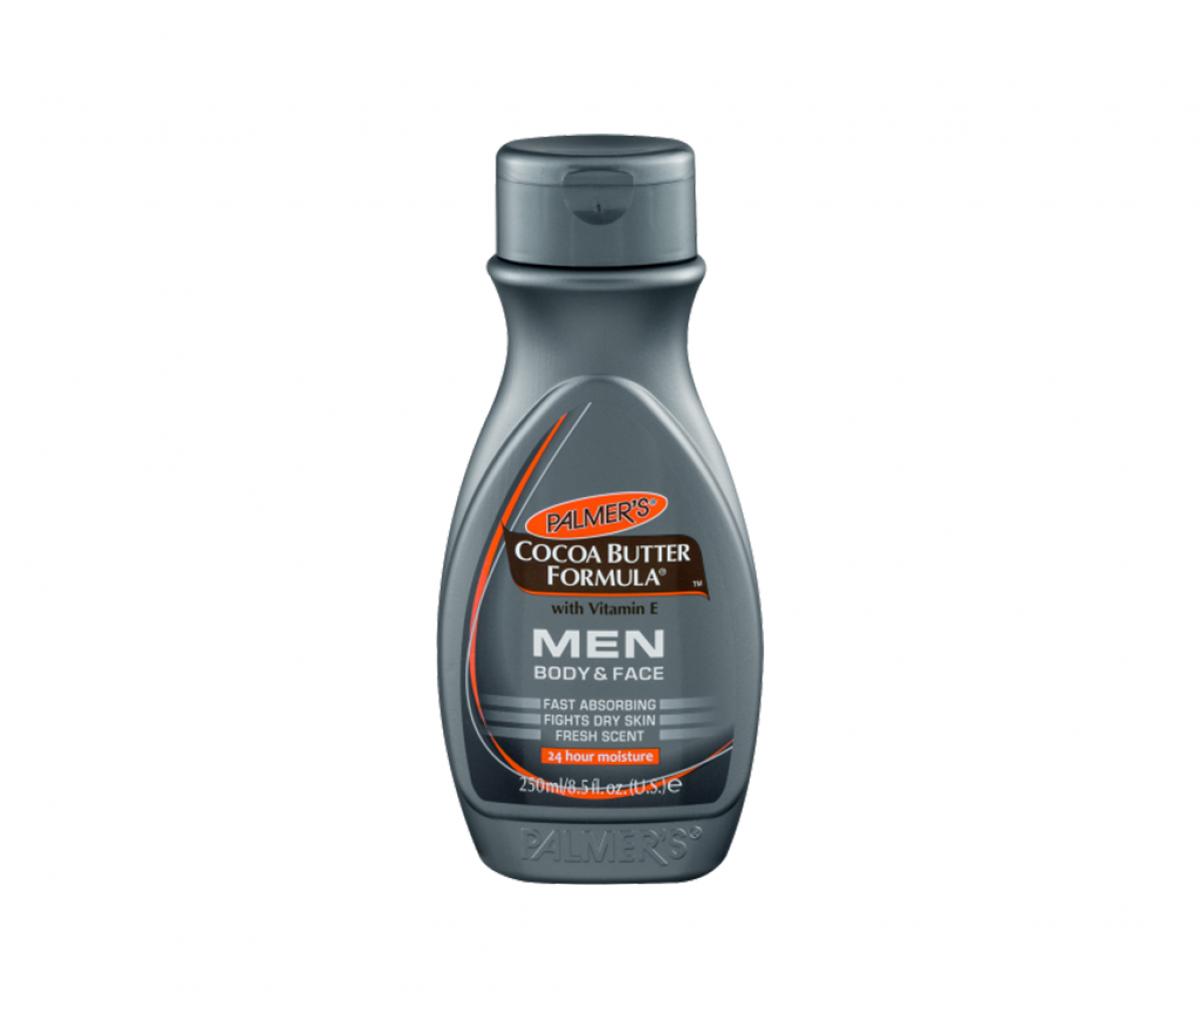 Palmers cocoa butter formula lotion men